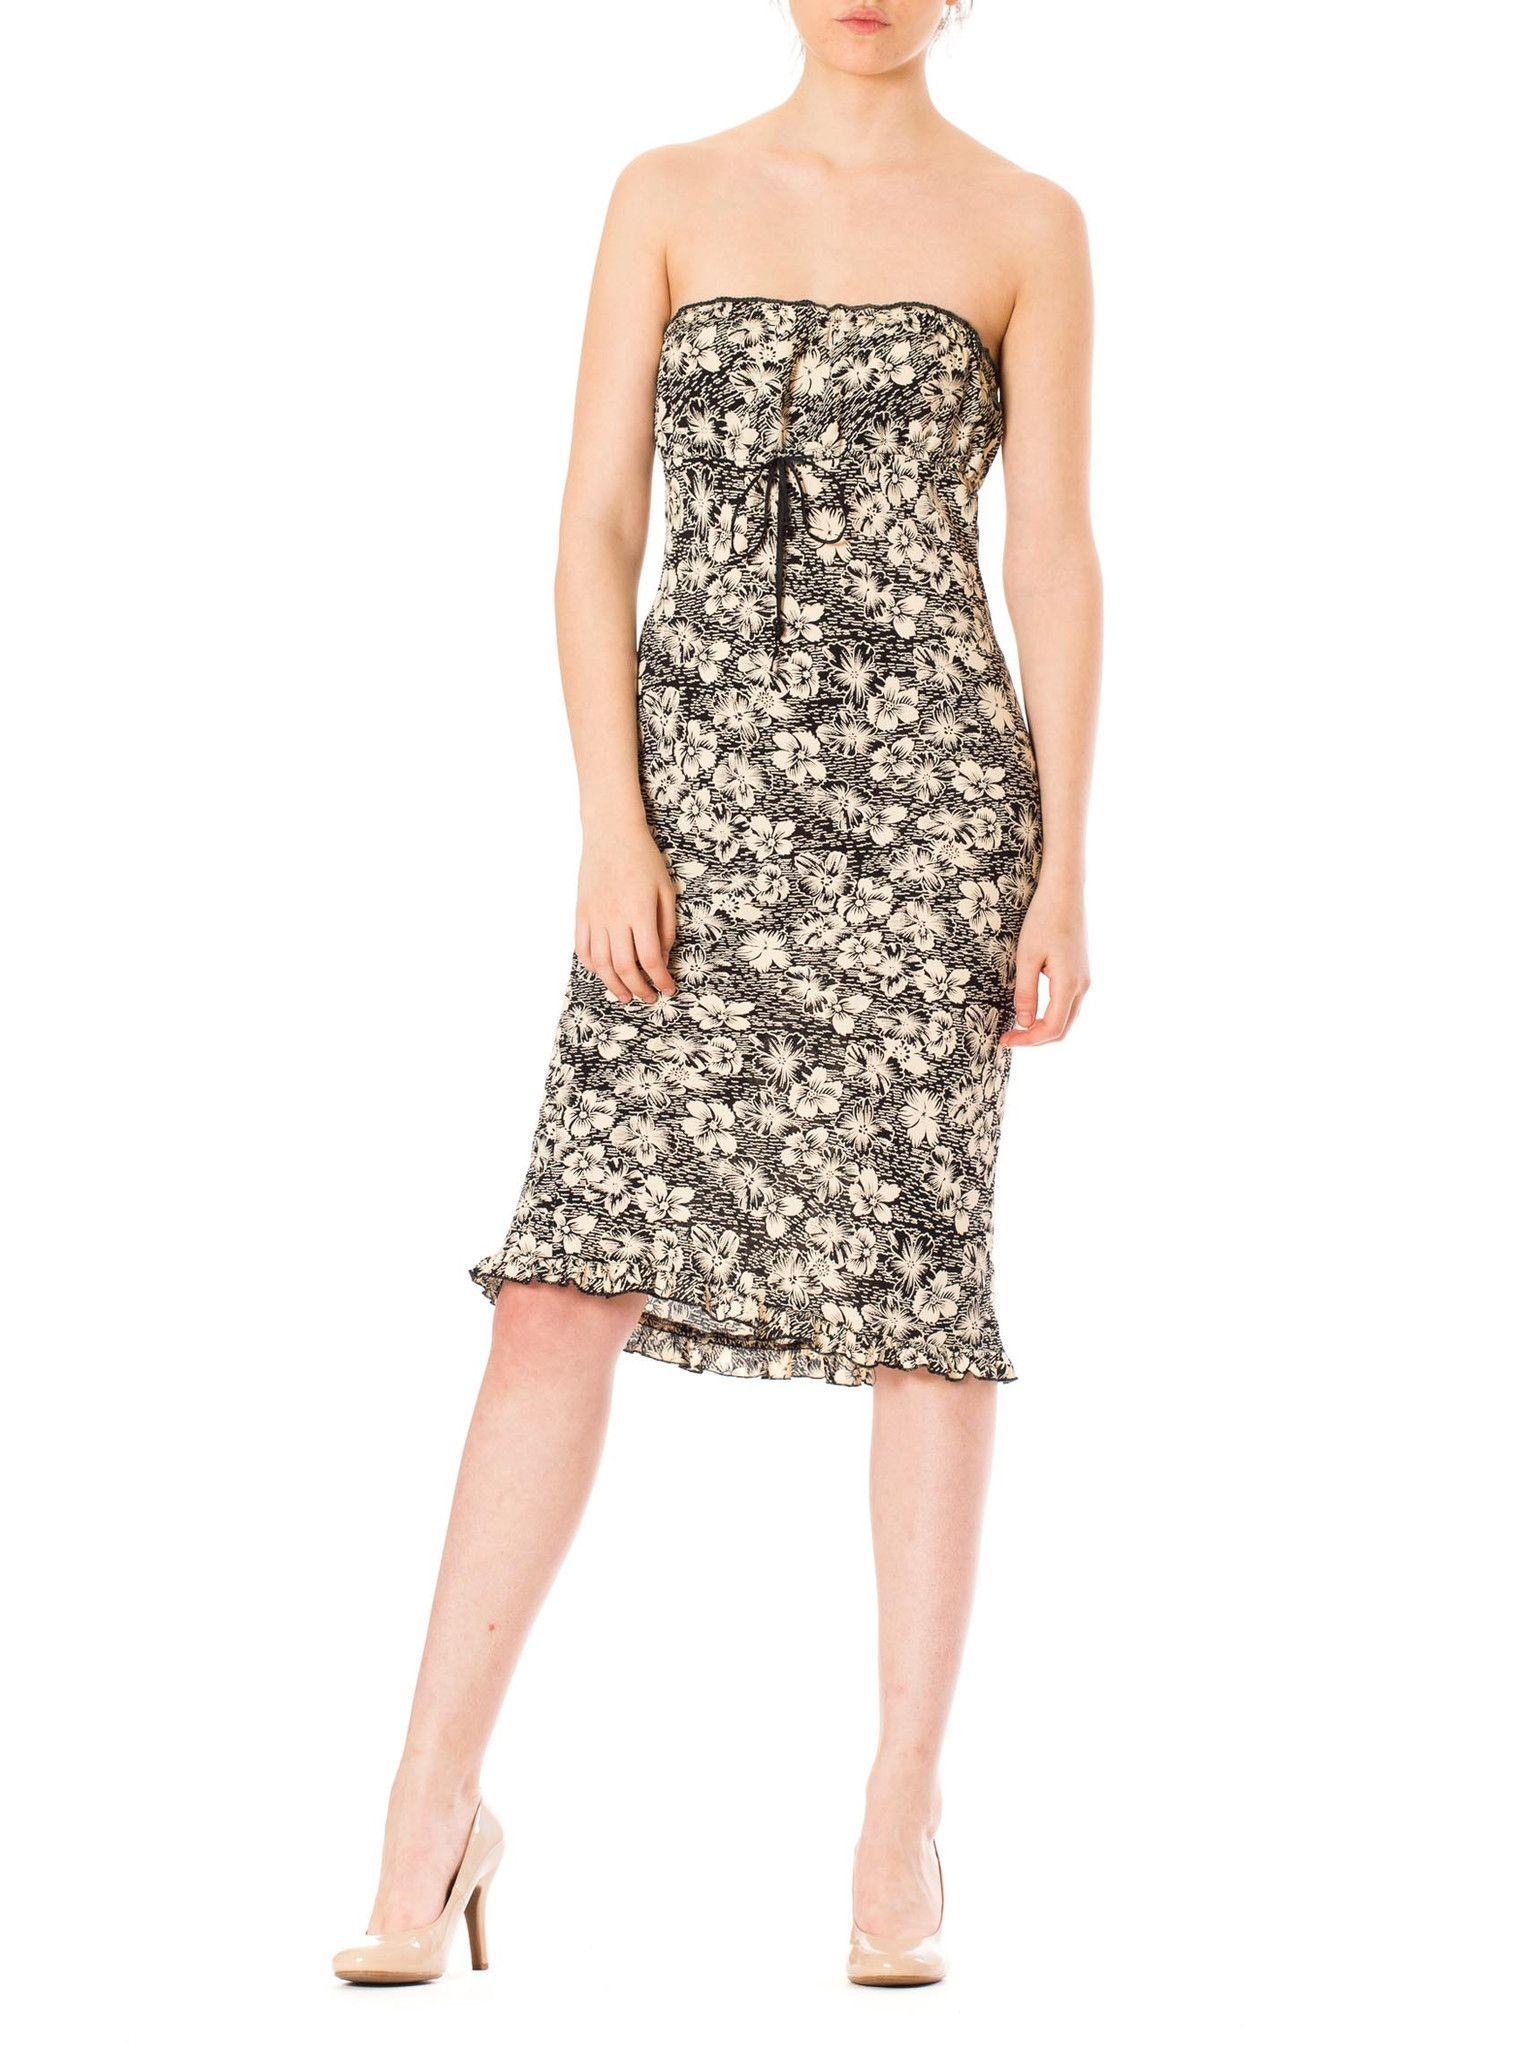 1980s Strapless Black & White Tropical Floral Print Mini Dress